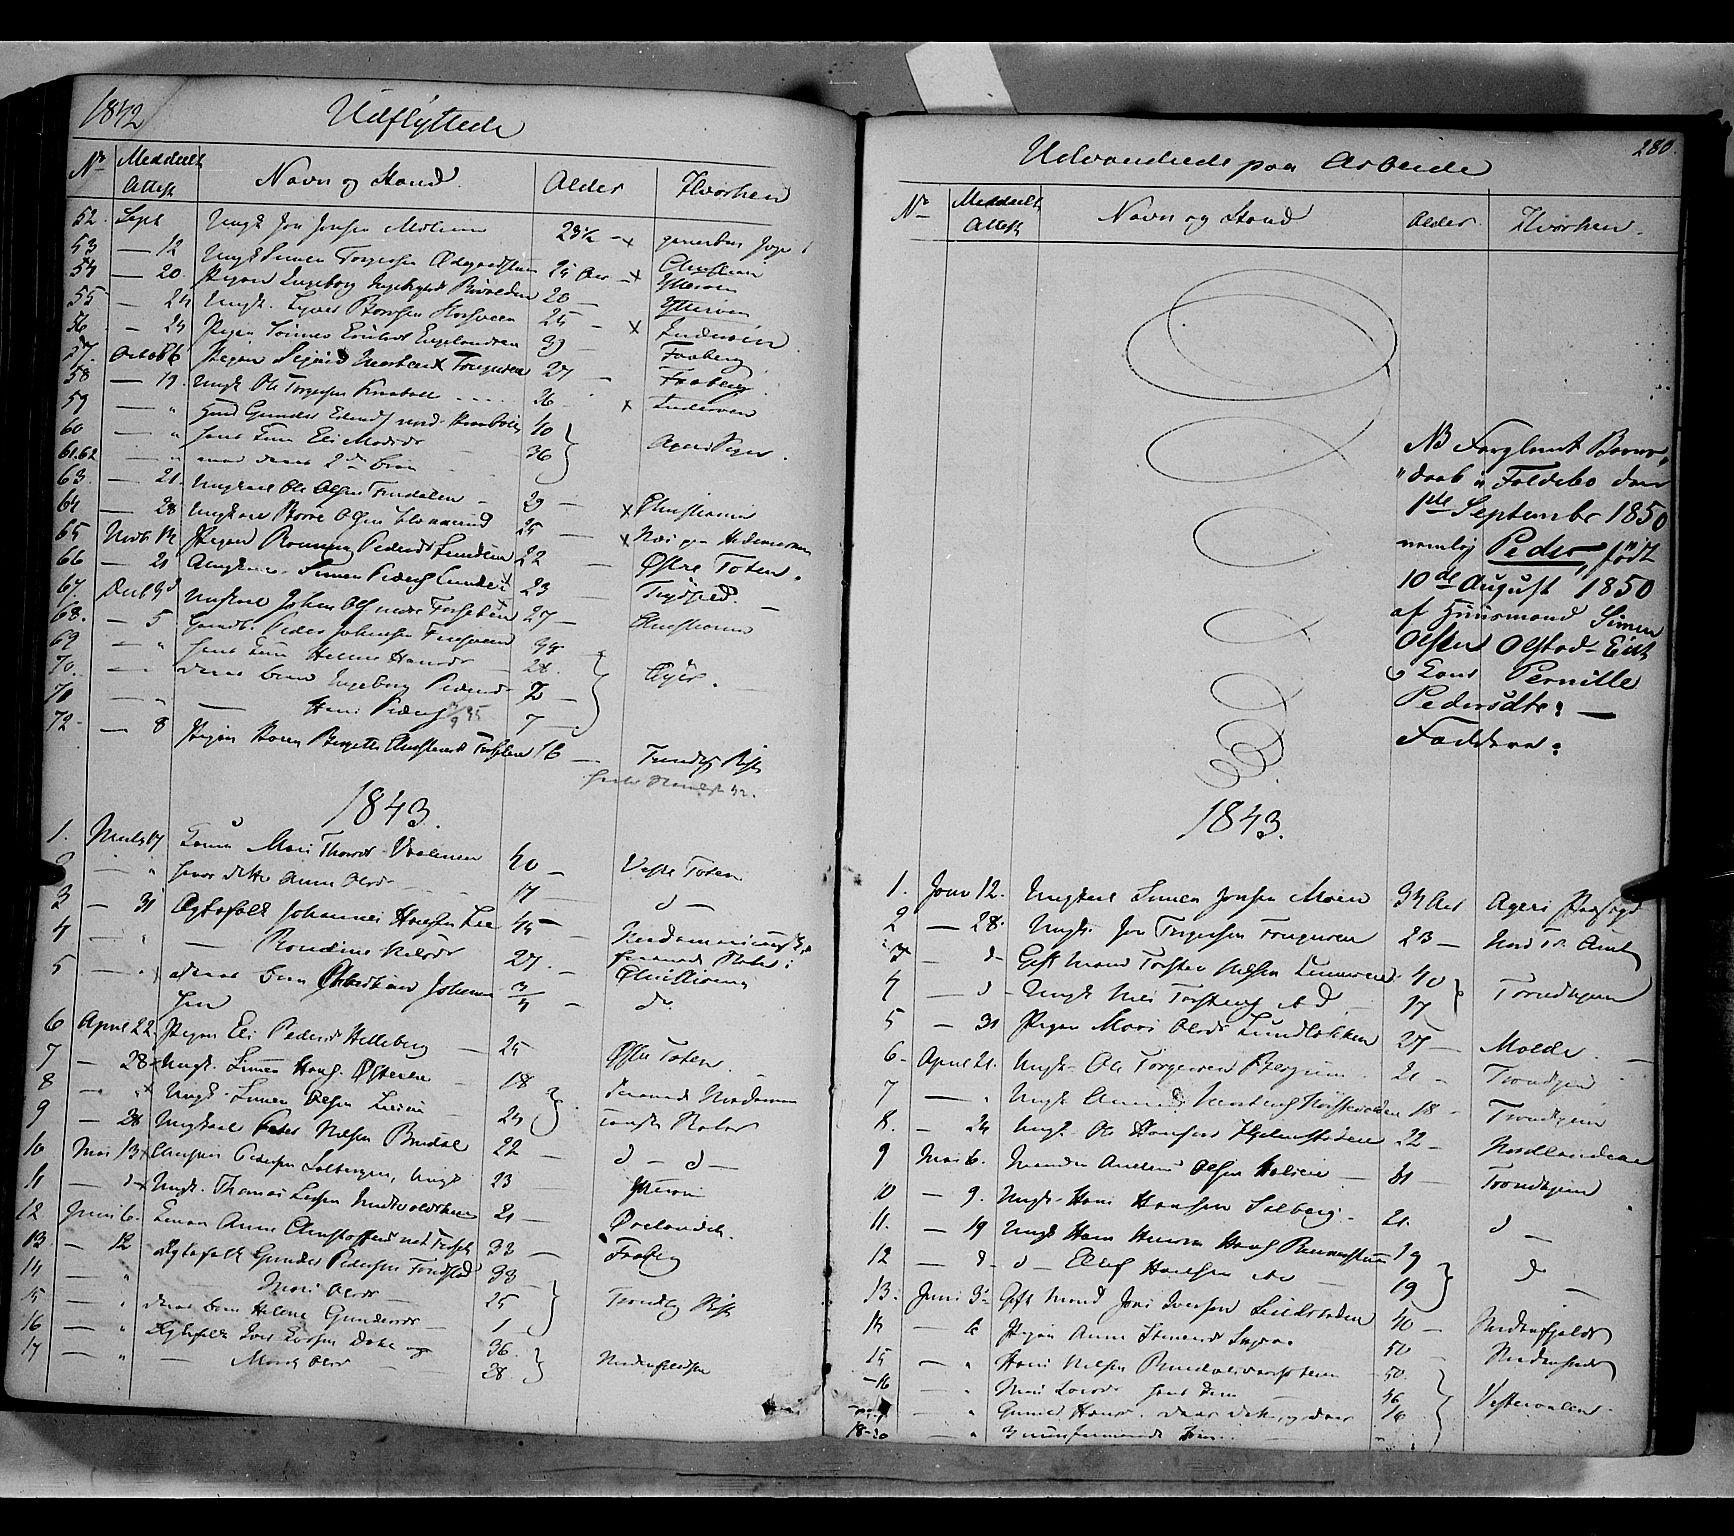 SAH, Gausdal prestekontor, Ministerialbok nr. 7, 1840-1850, s. 280